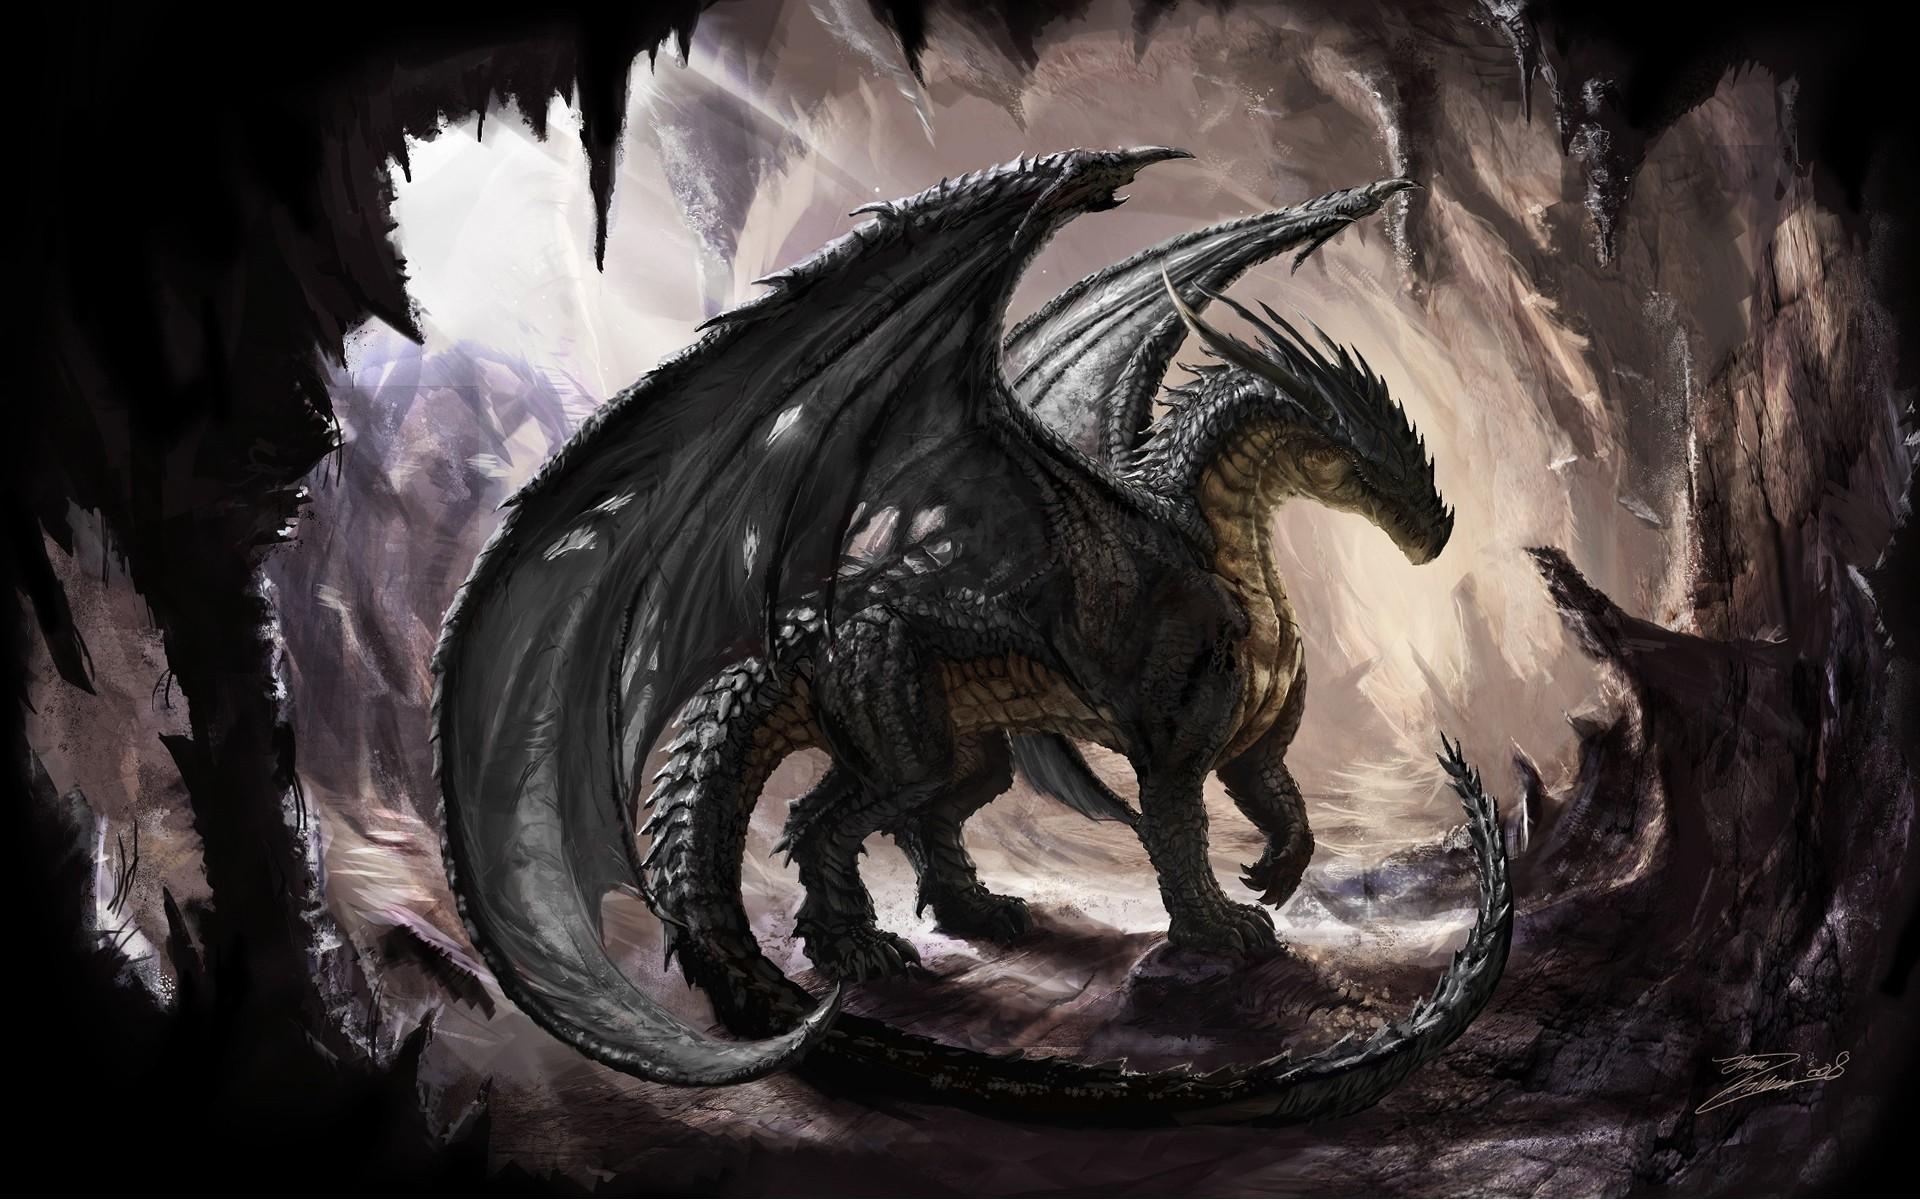 76 Black Dragon Wallpaper On Wallpapersafari